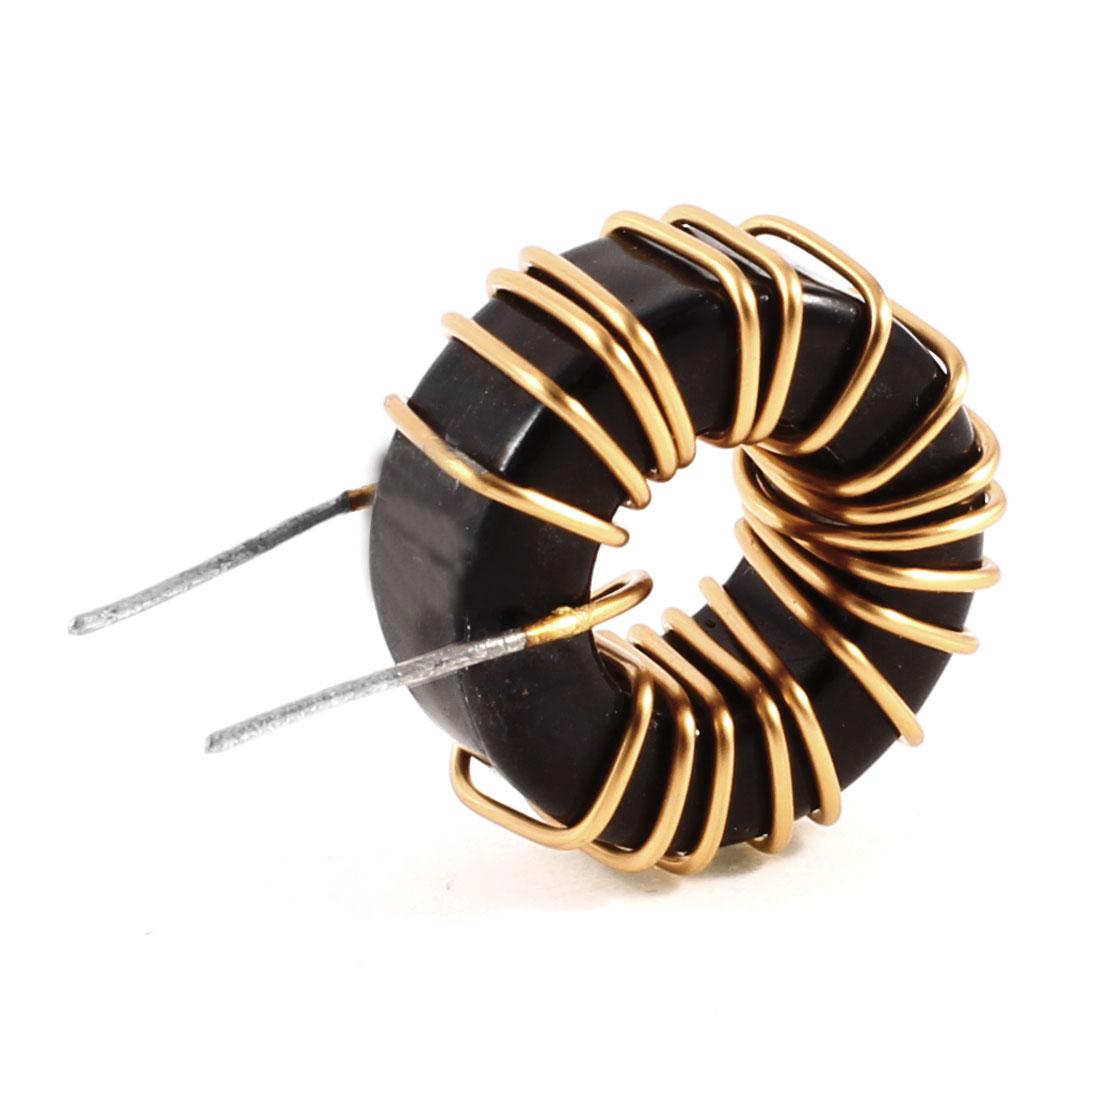 Ferrite Core Toroid Toroidal Inductor 56uH 36mOhm 5A Coil